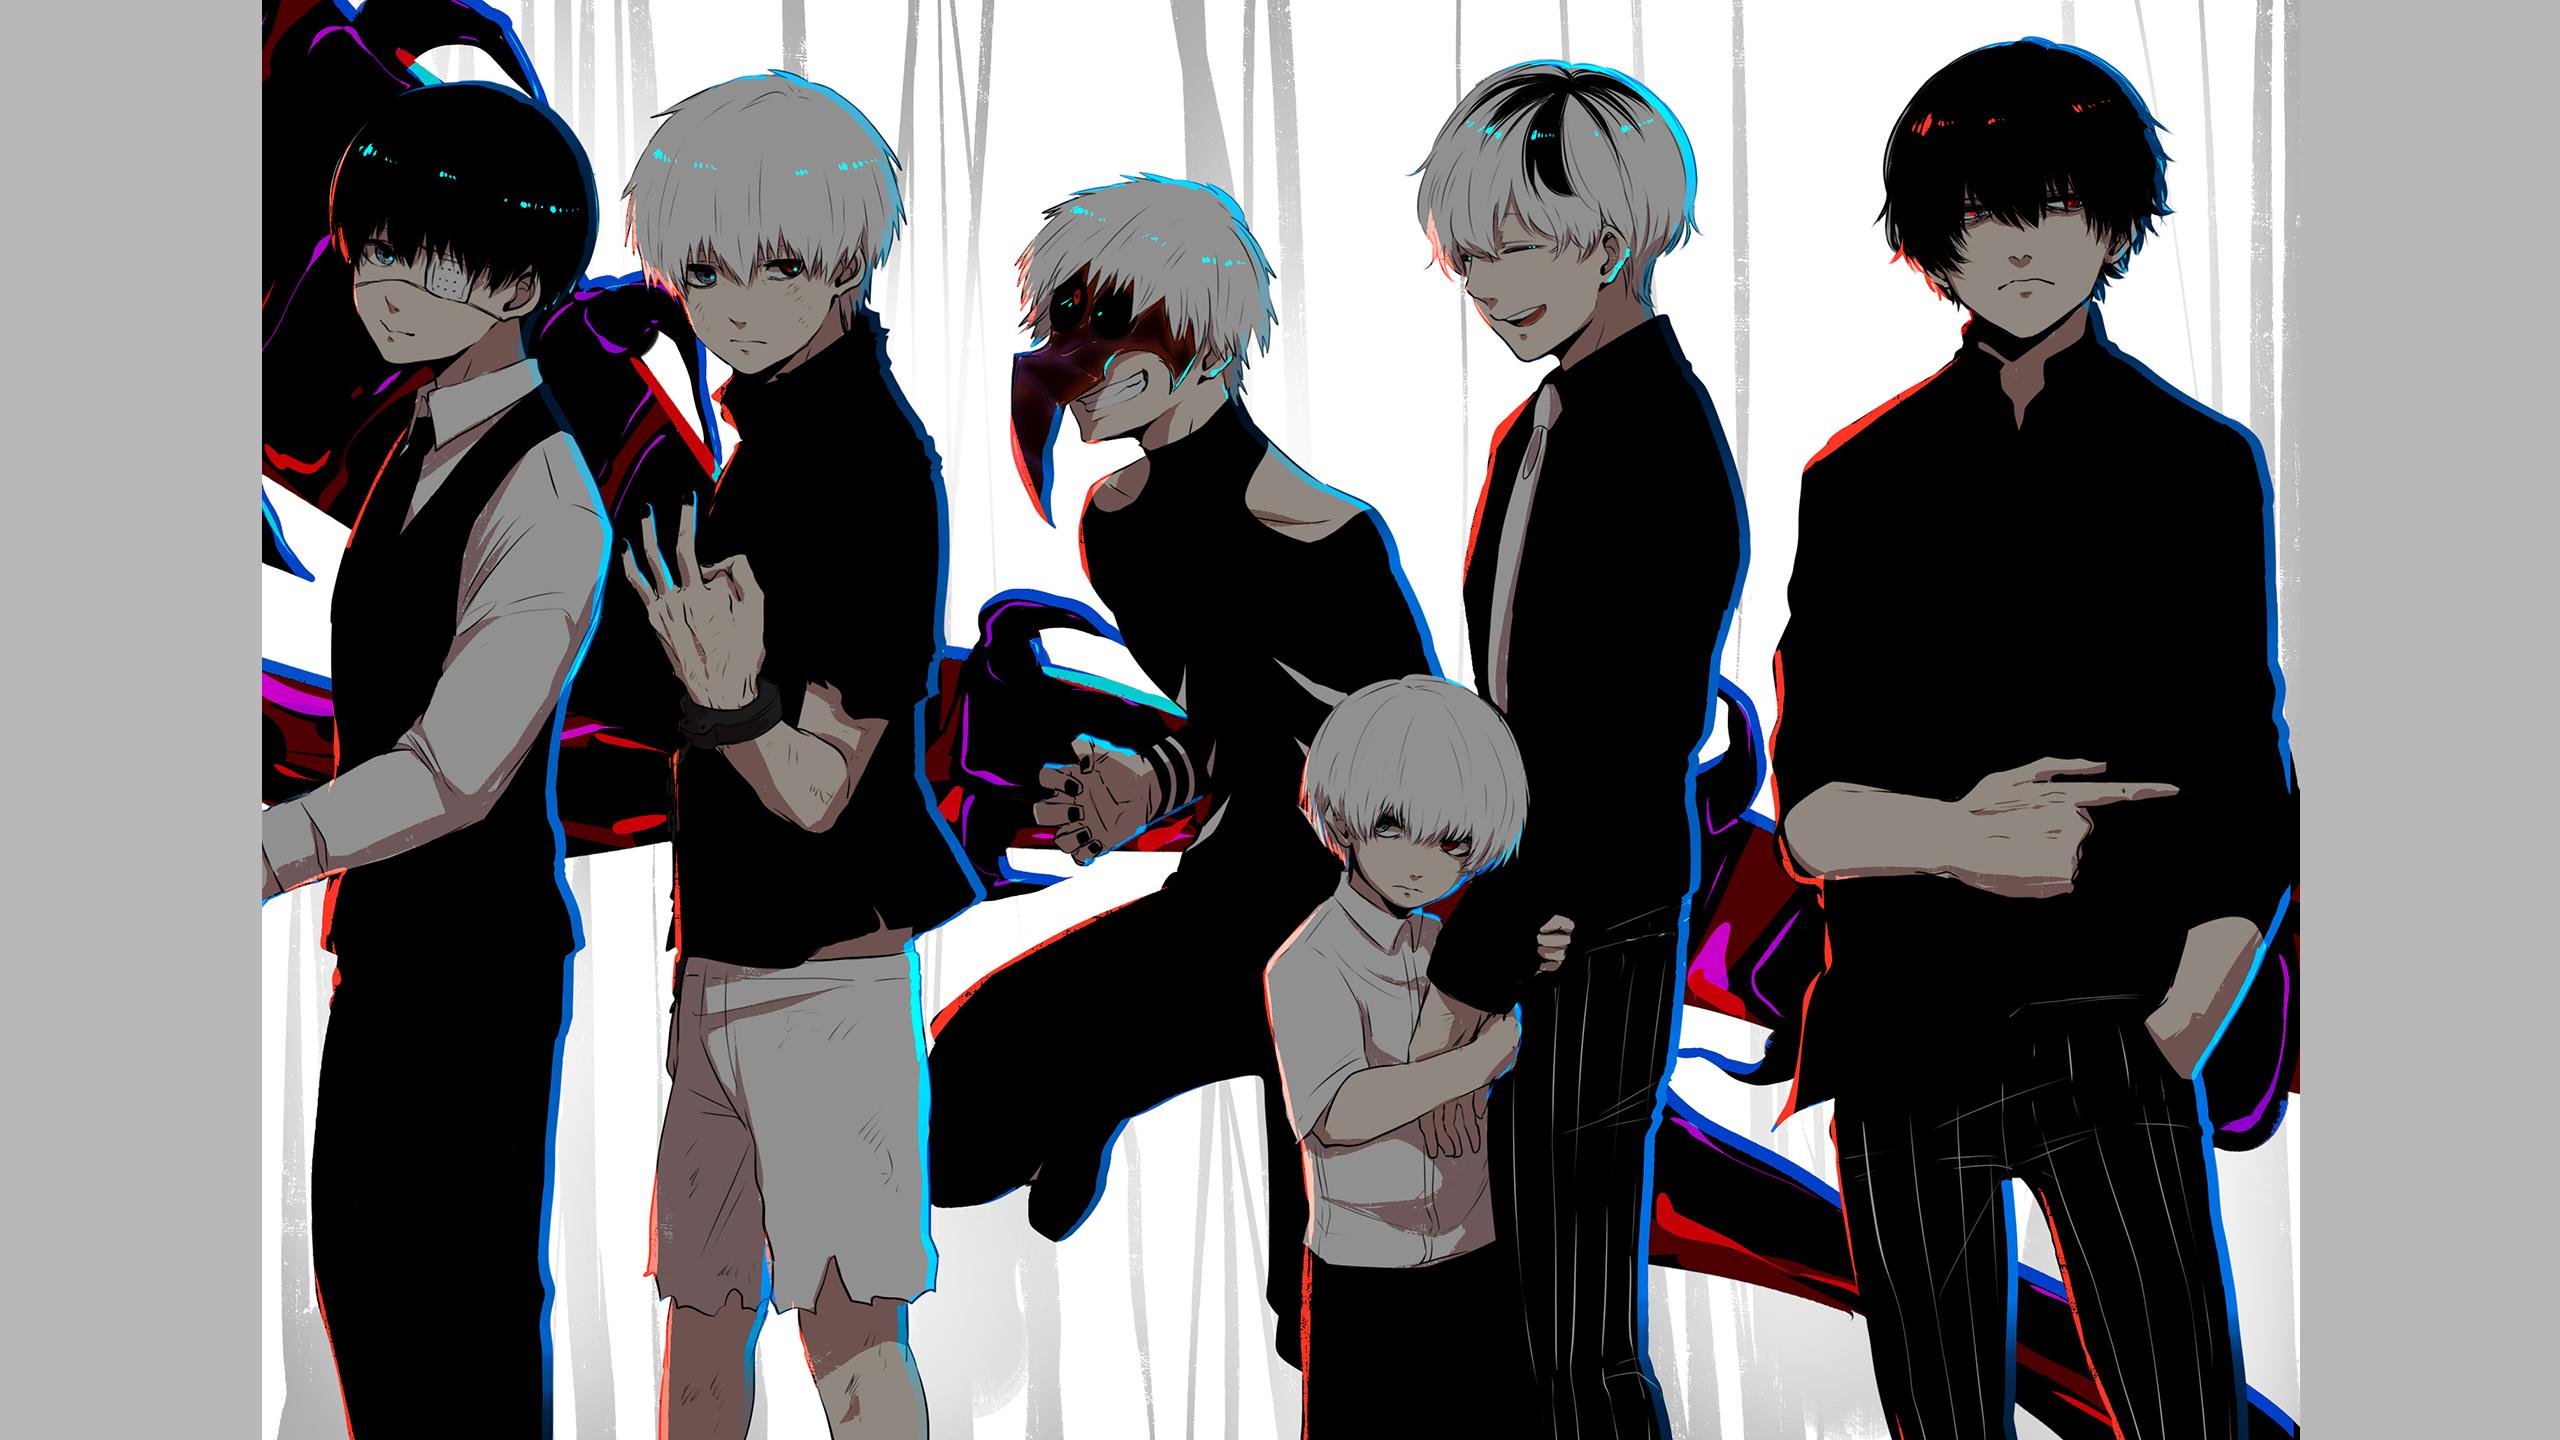 Fondos De Pantalla Kaneki Ken Tokyo Ghoul Re Chicos